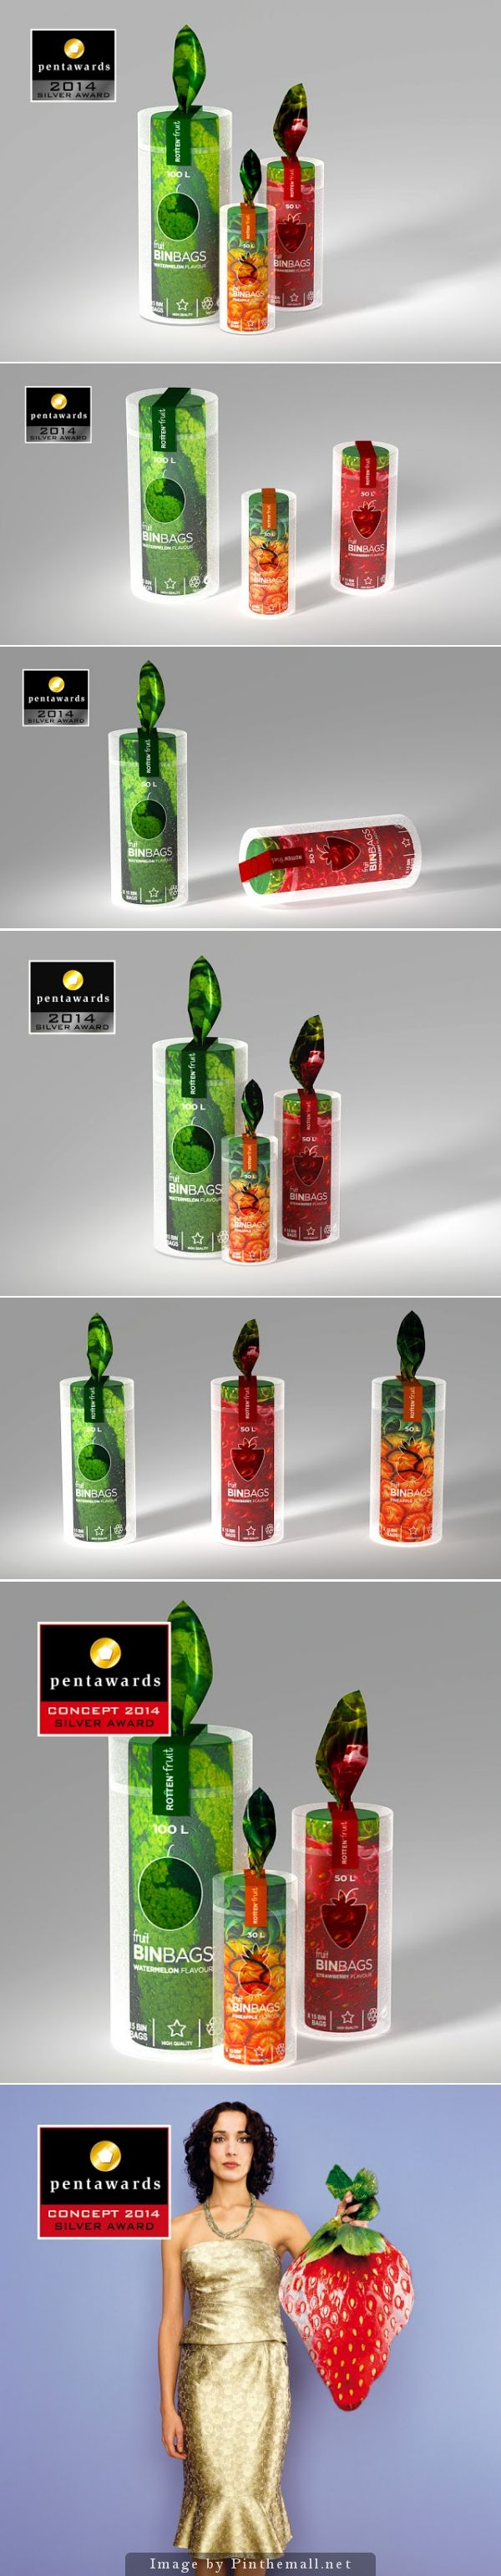 ROTTEN FRUIT (Concept) by Manon Fauvel #packaging #pentawards - http://www.packagingoftheworld.com/2014/11/rotten-fruit-concept.html